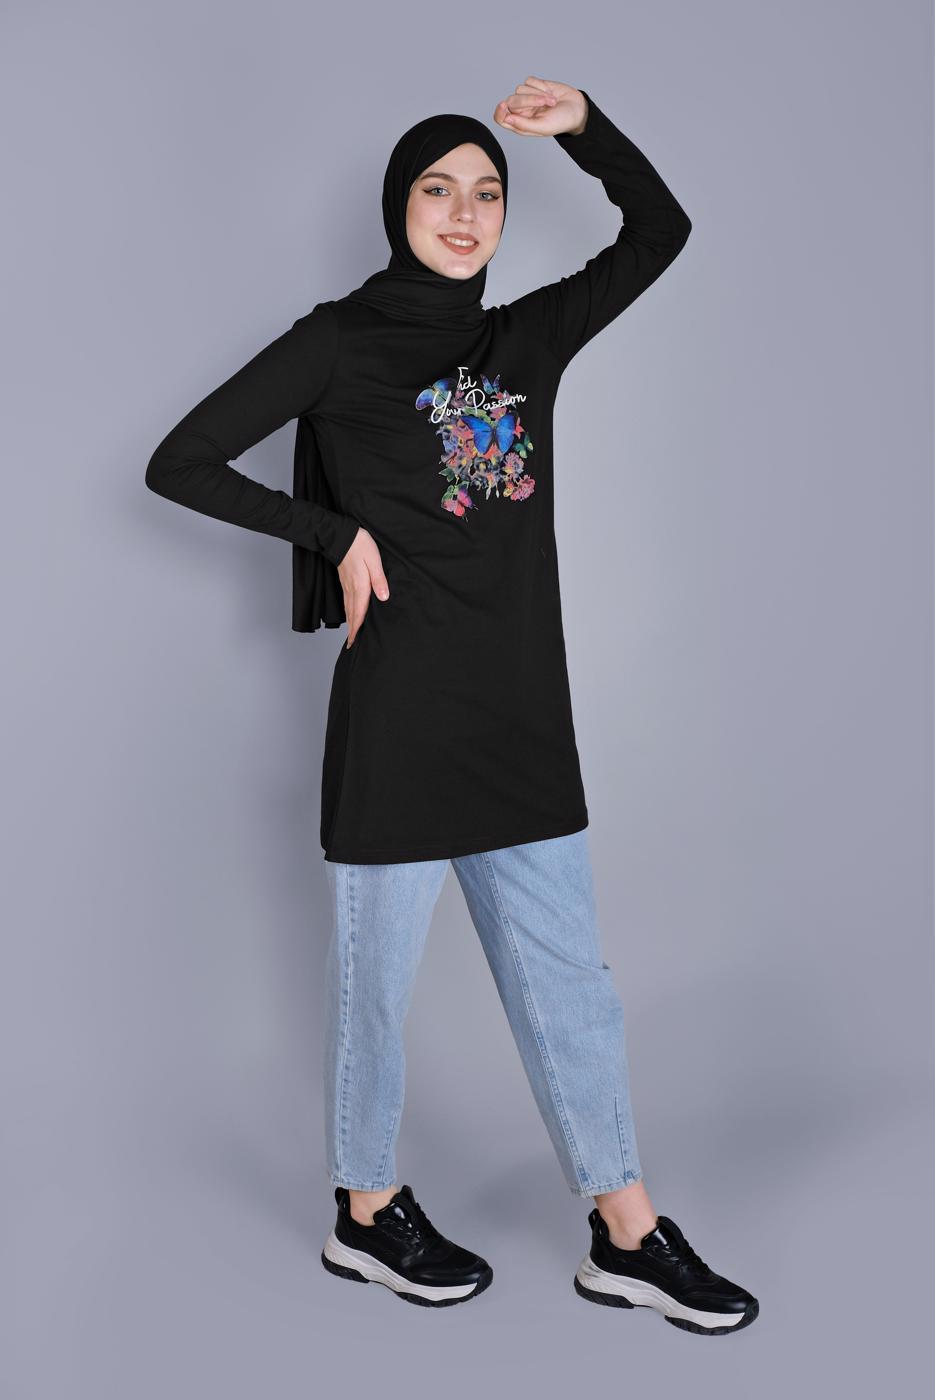 Bayan SİYAH MİX DESENLİ PAMUKLU TUNİK 9206